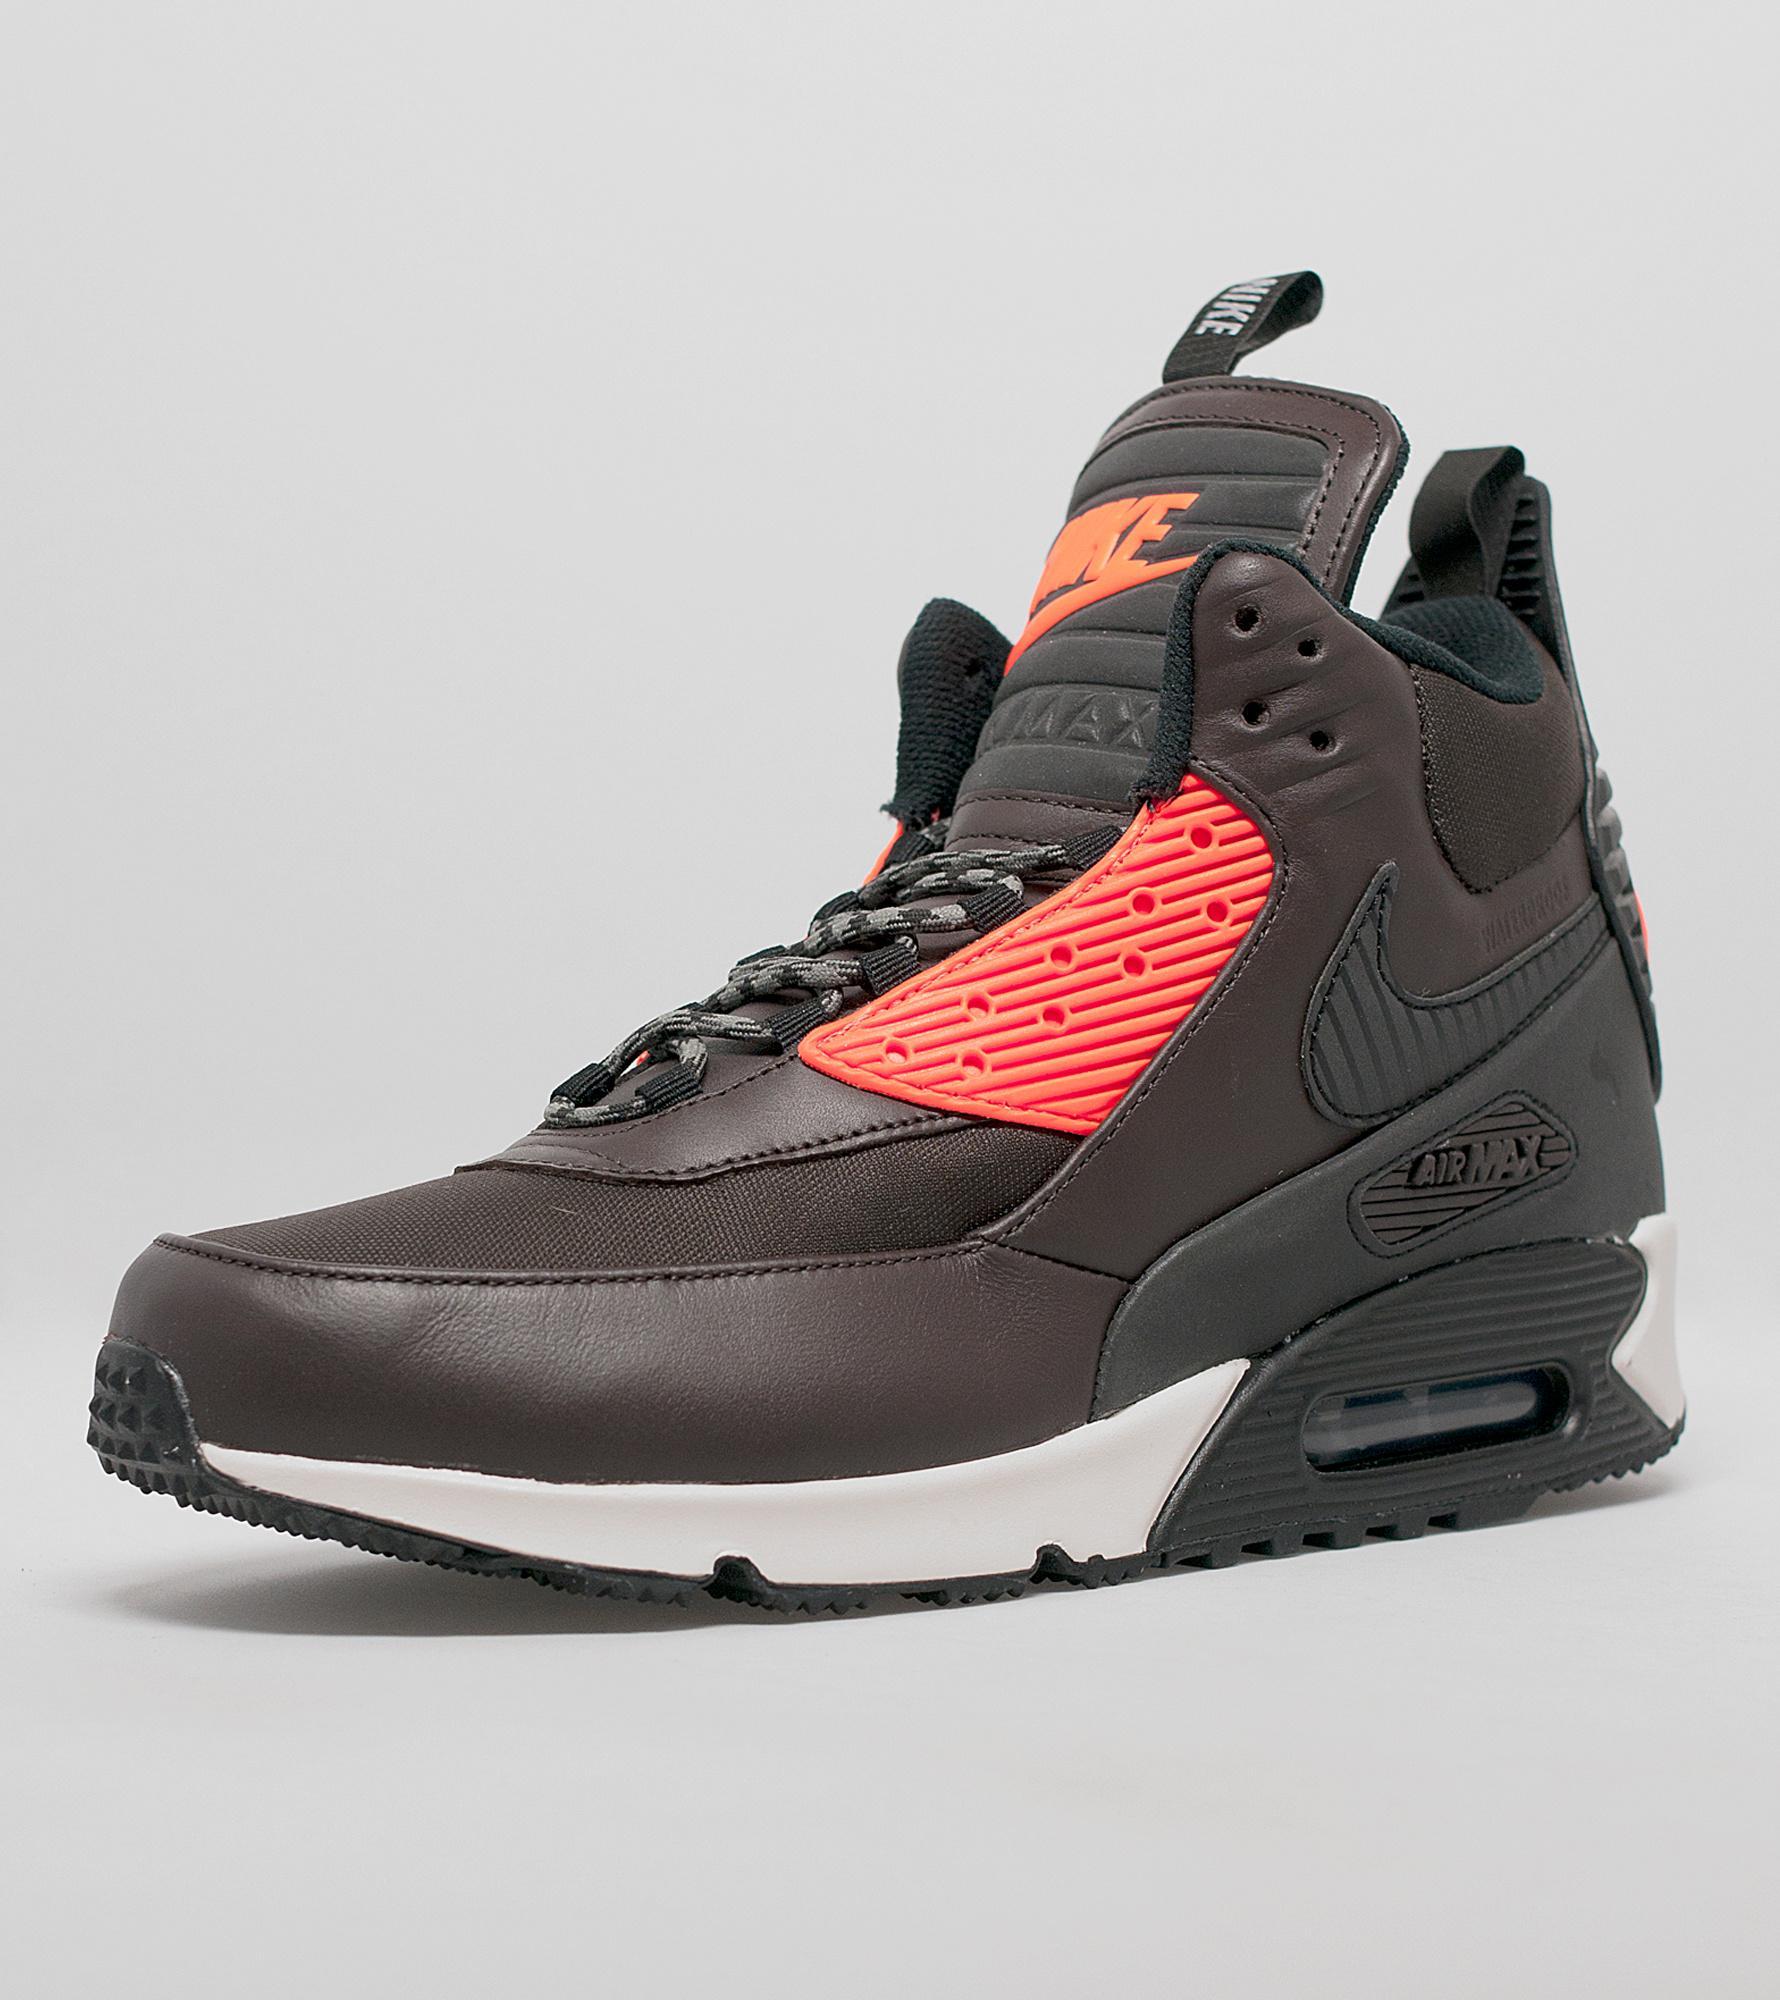 Nike Air Max 90 Sneakers Démarrage Hiver Images Uk amazone en ligne vente  profiter d8DBth